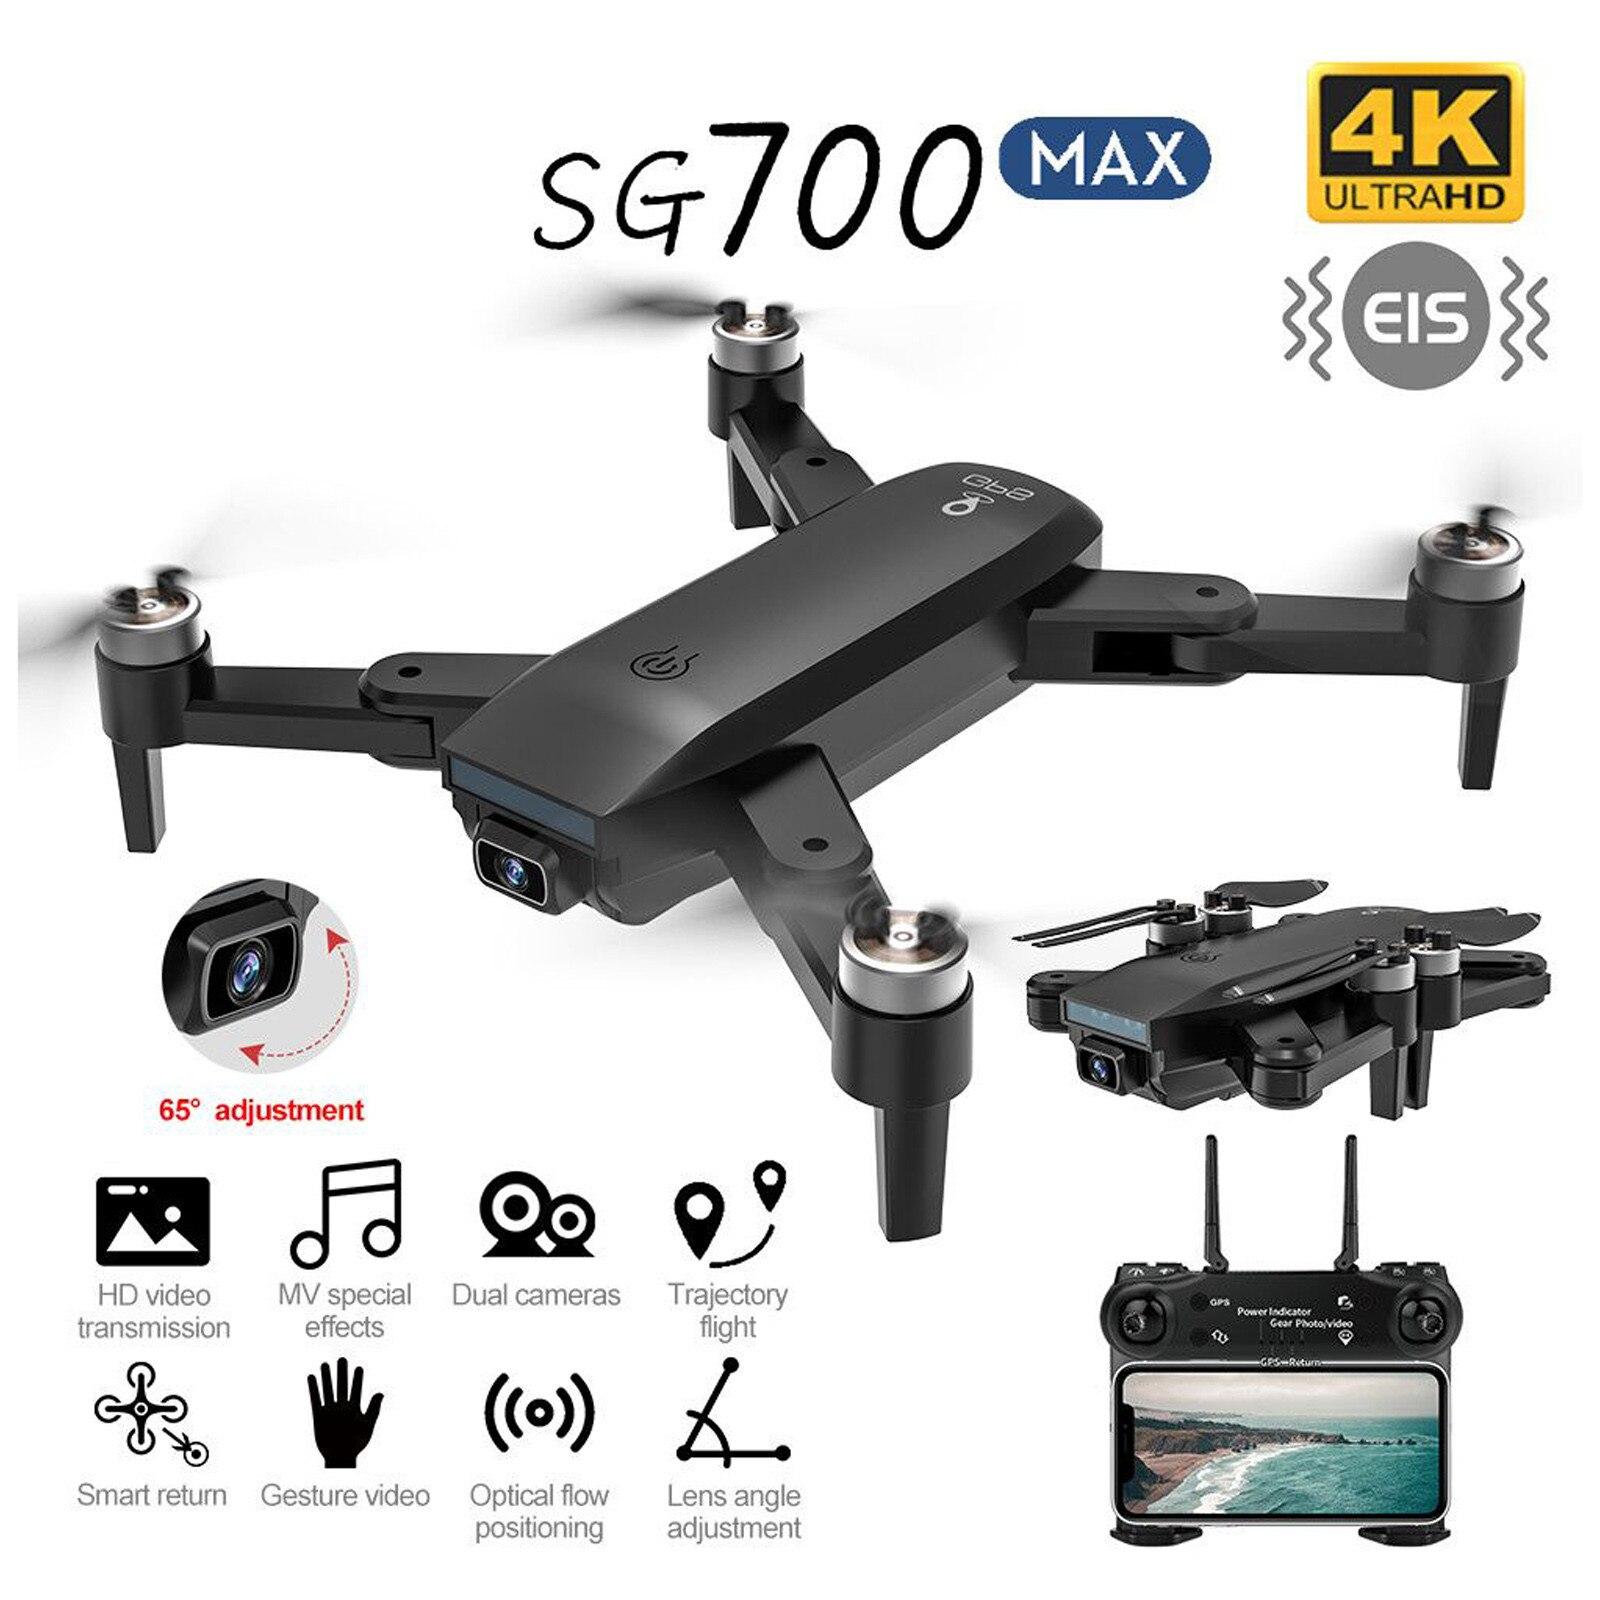 SG700 برو ماكس لتحديد المواقع بدون طيار مع 4K HD كاميرا 5G واي فاي فيديو FPV رباعية RC المسافة 1 كجم فرش السيارات طوي كوادكوبتر درون